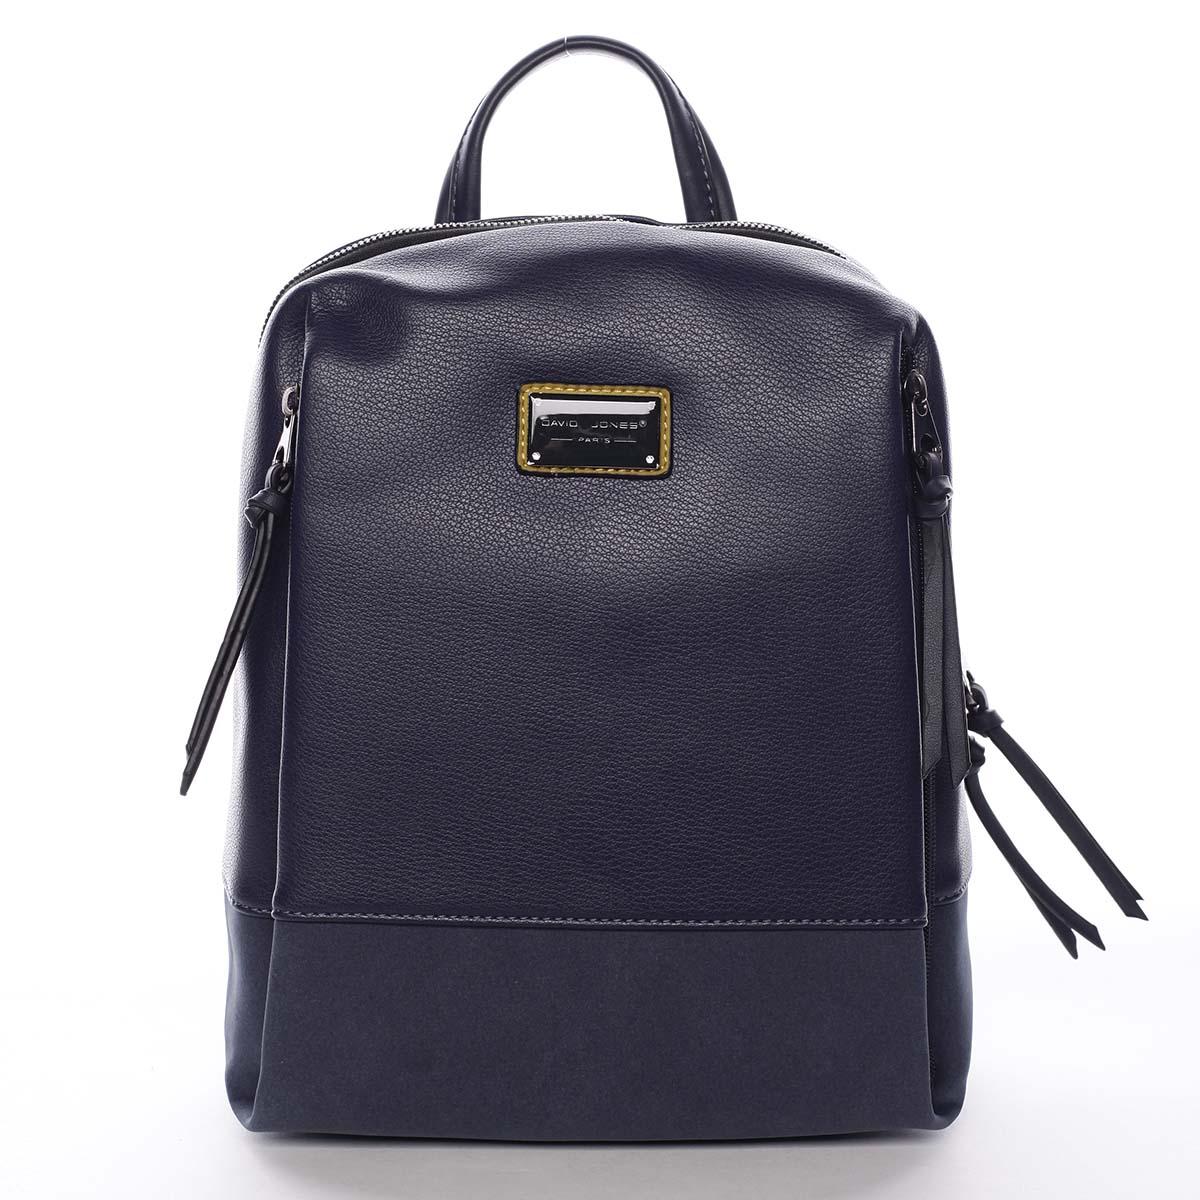 Dámský batoh tmavě modrý - David Jones Nova